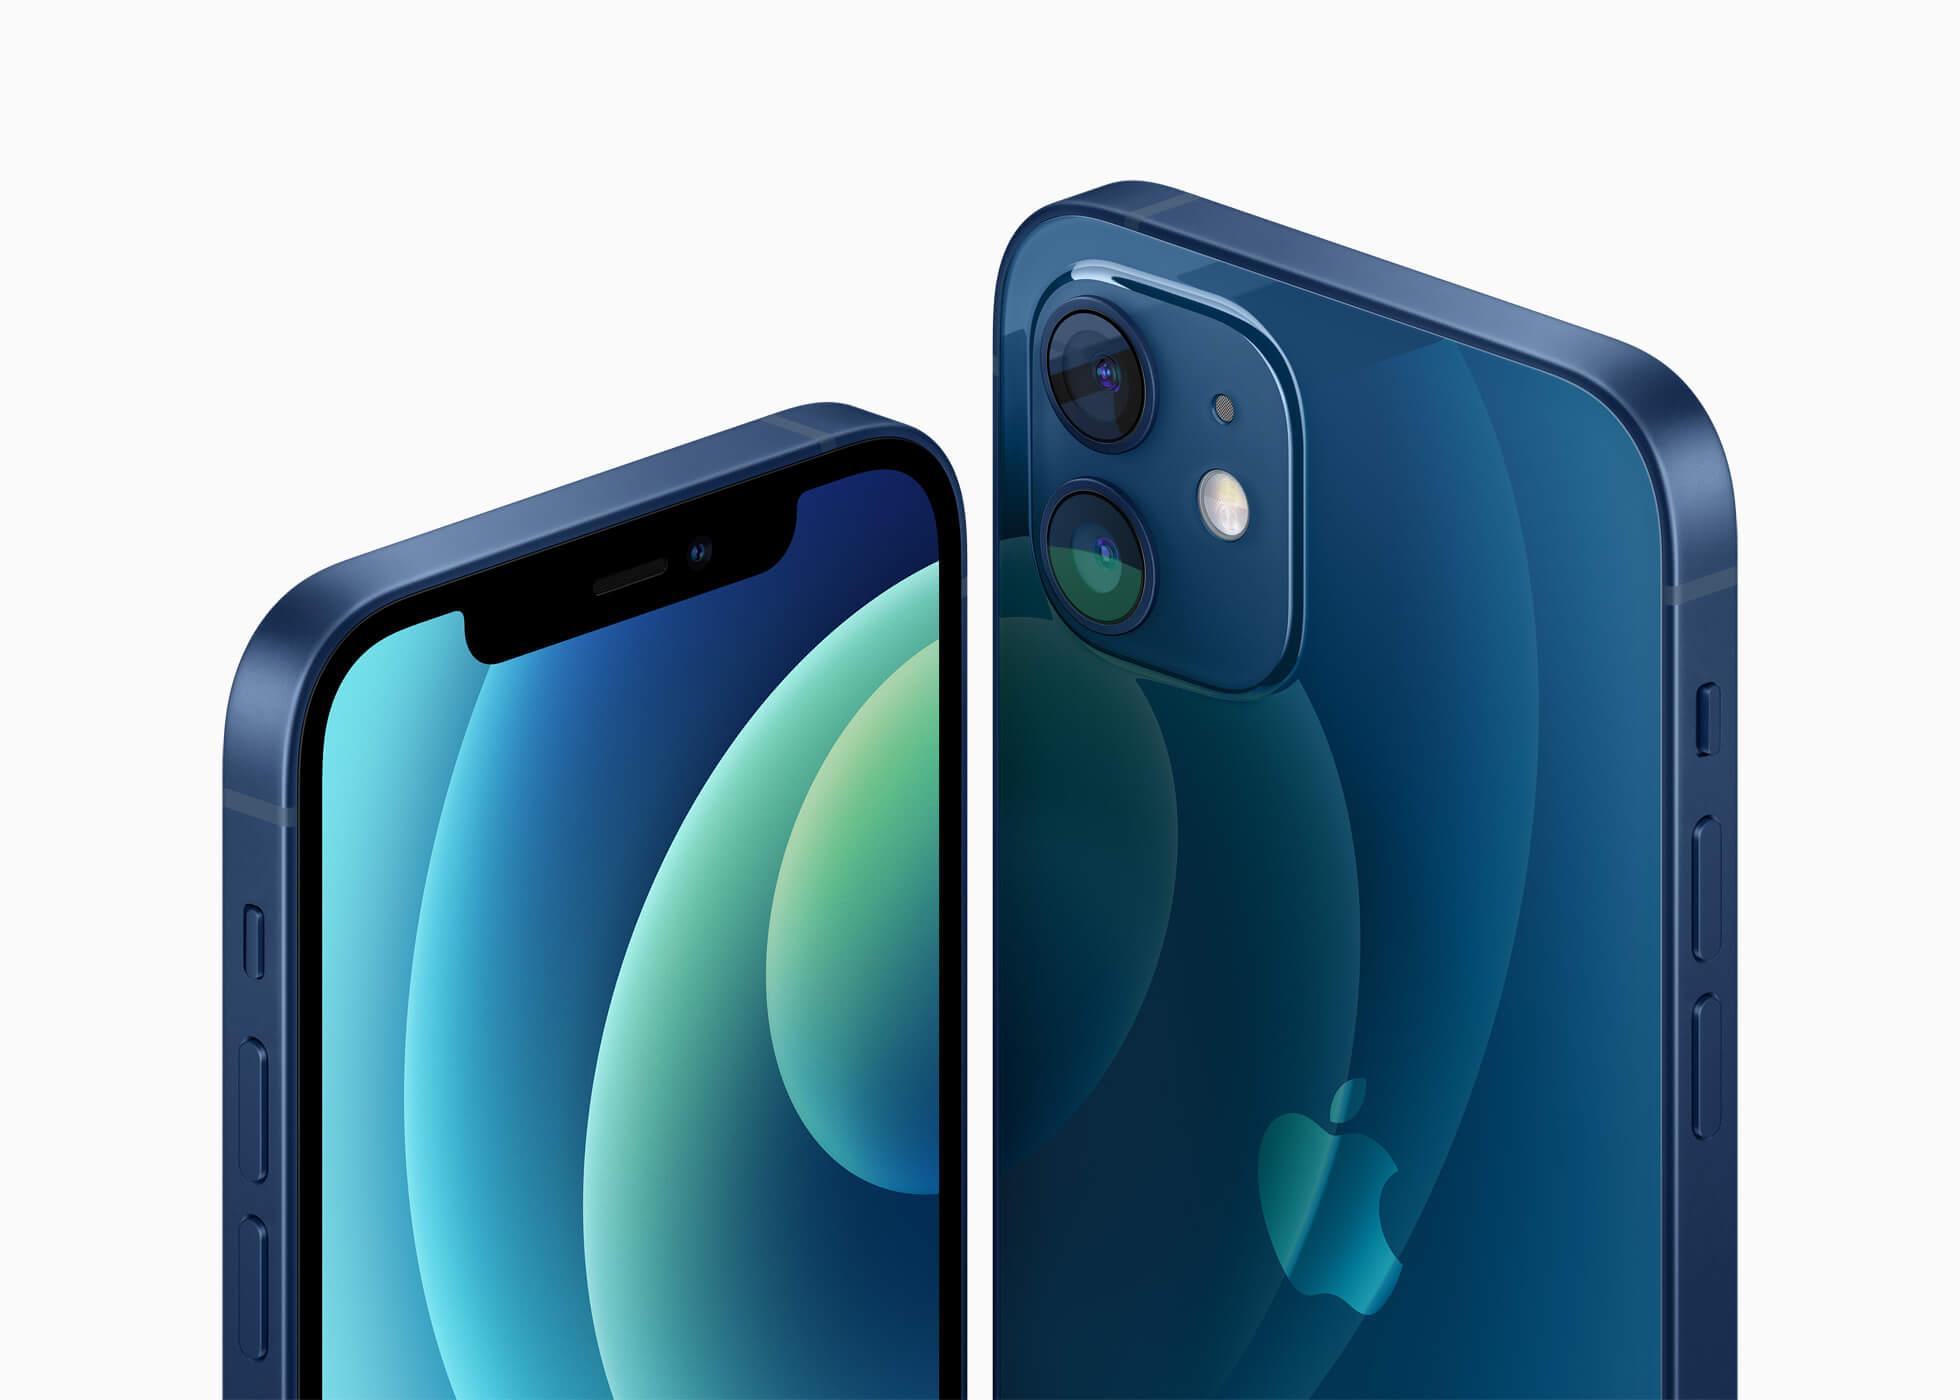 apple iphone 12 color blue 10132020 1